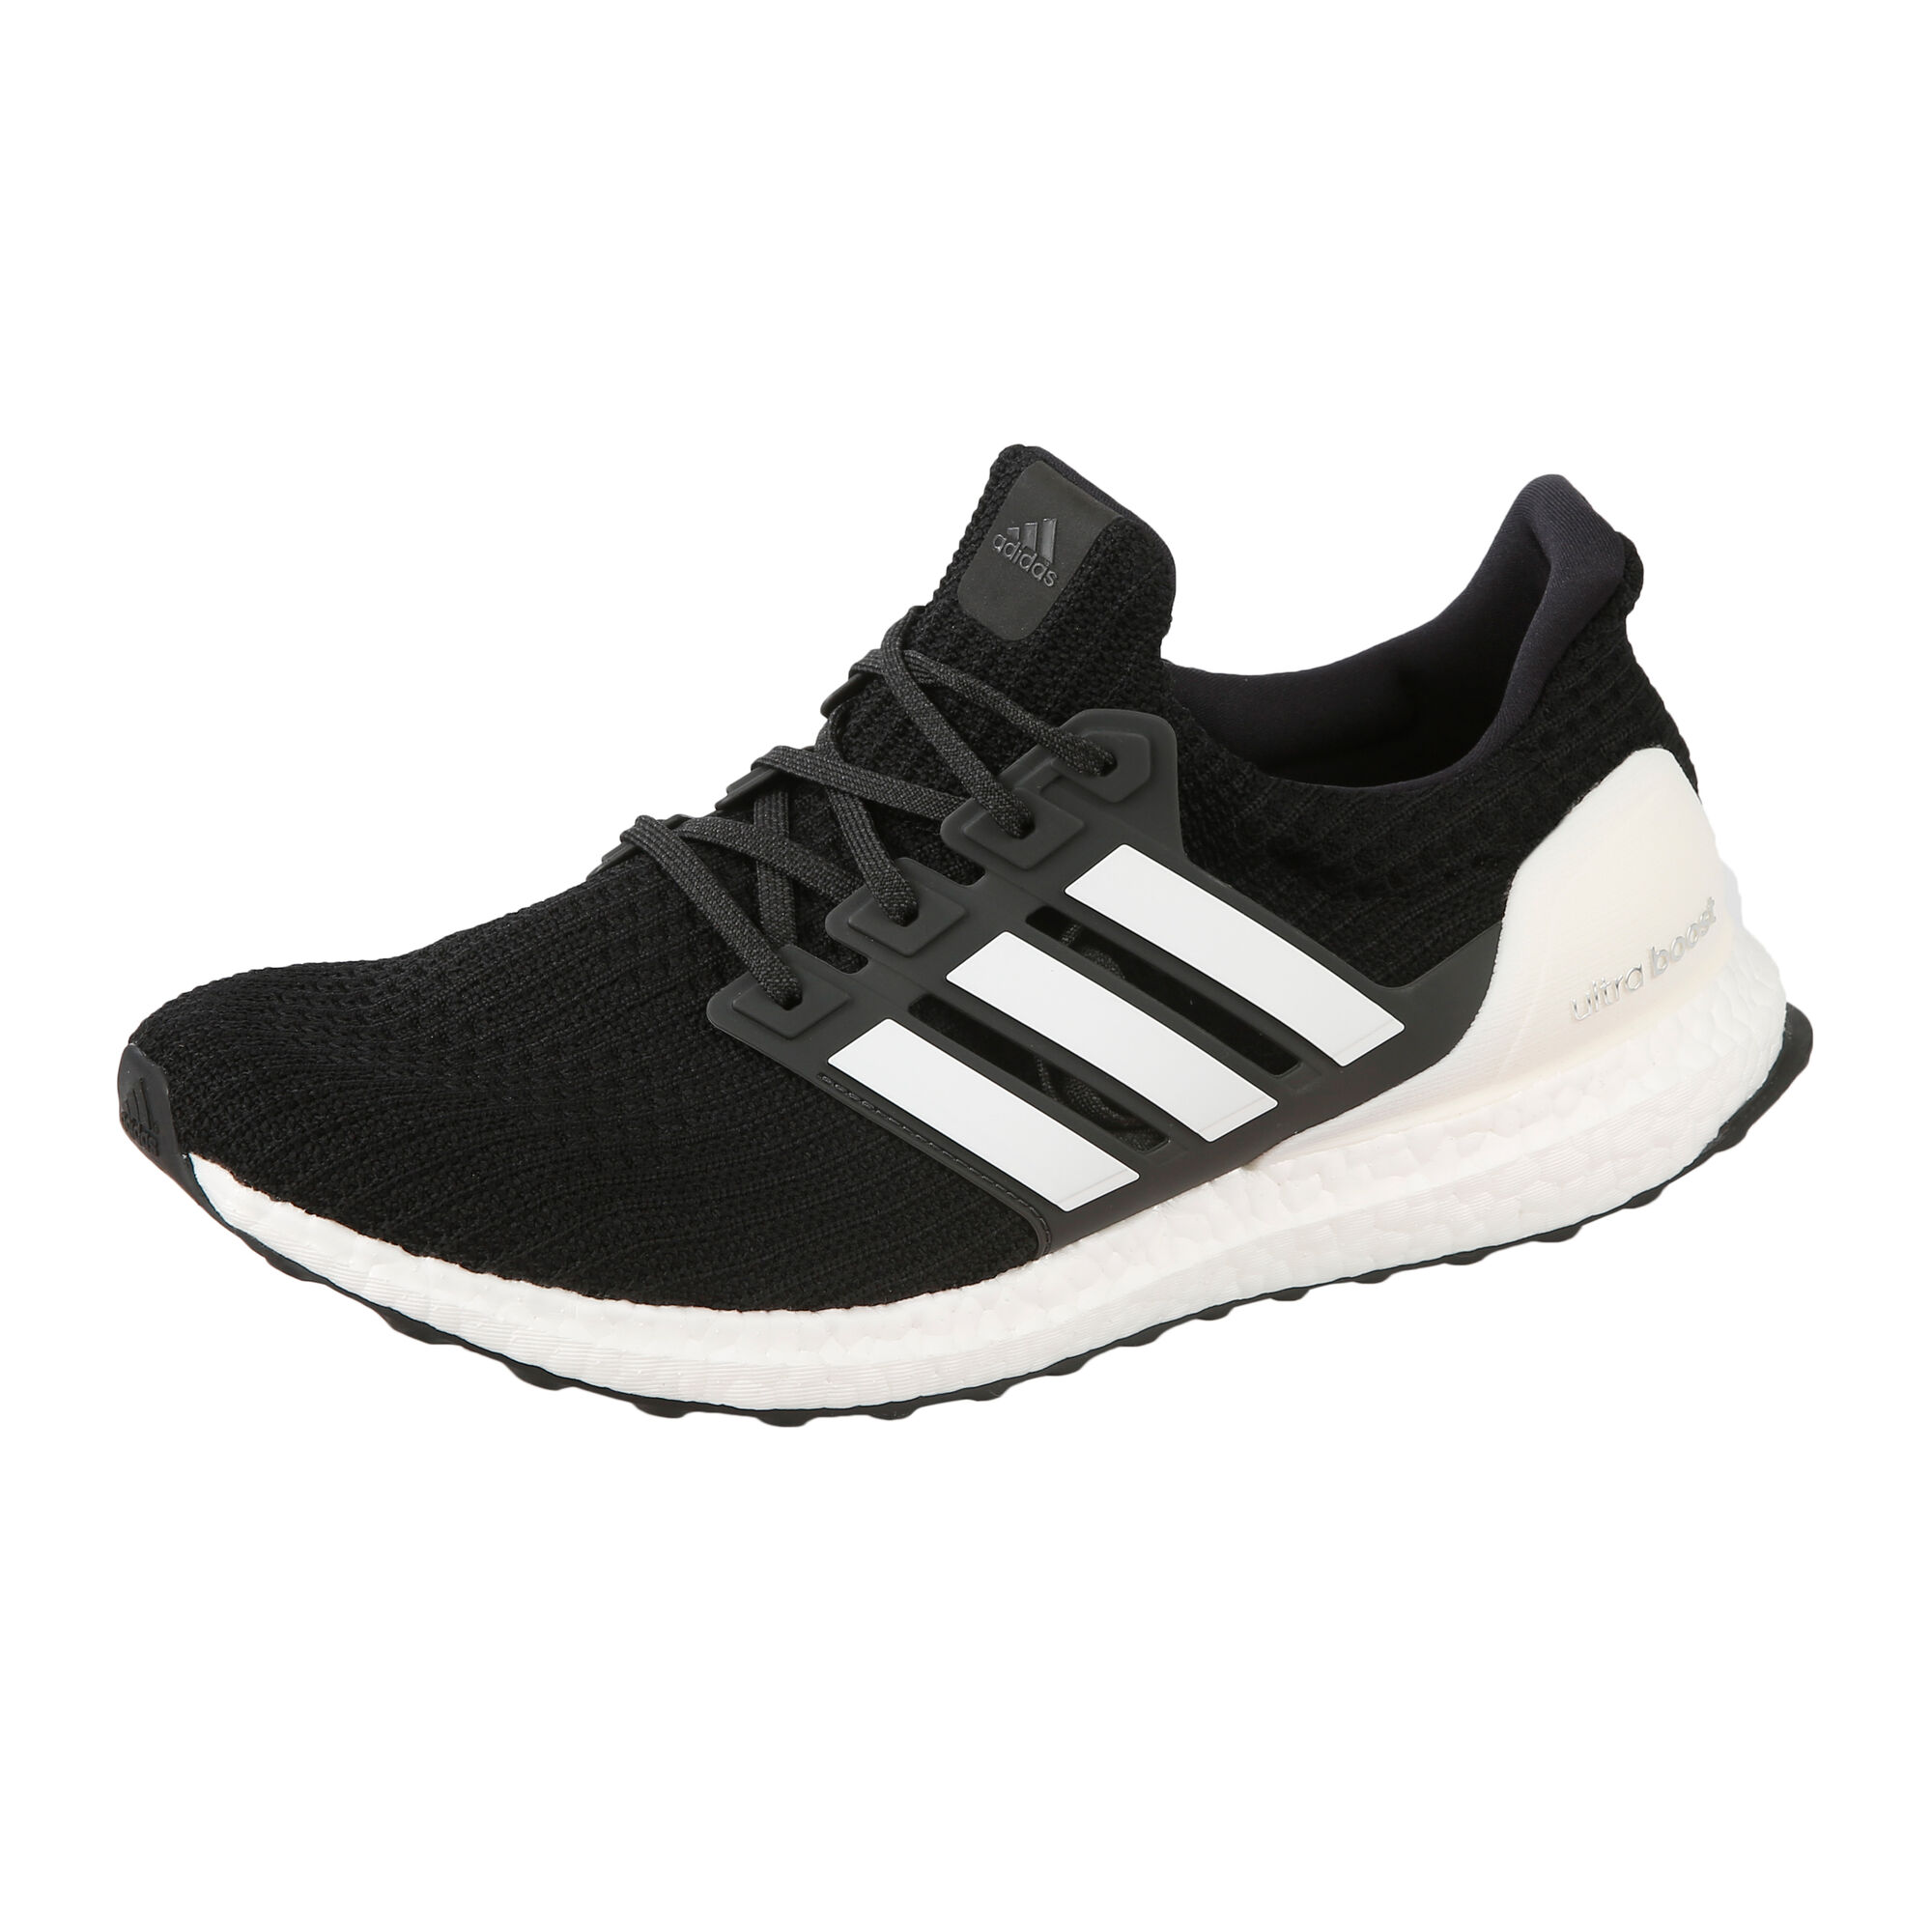 c93d21211 buy adidas Ultra Boost Neutral Running Shoe Men - Black